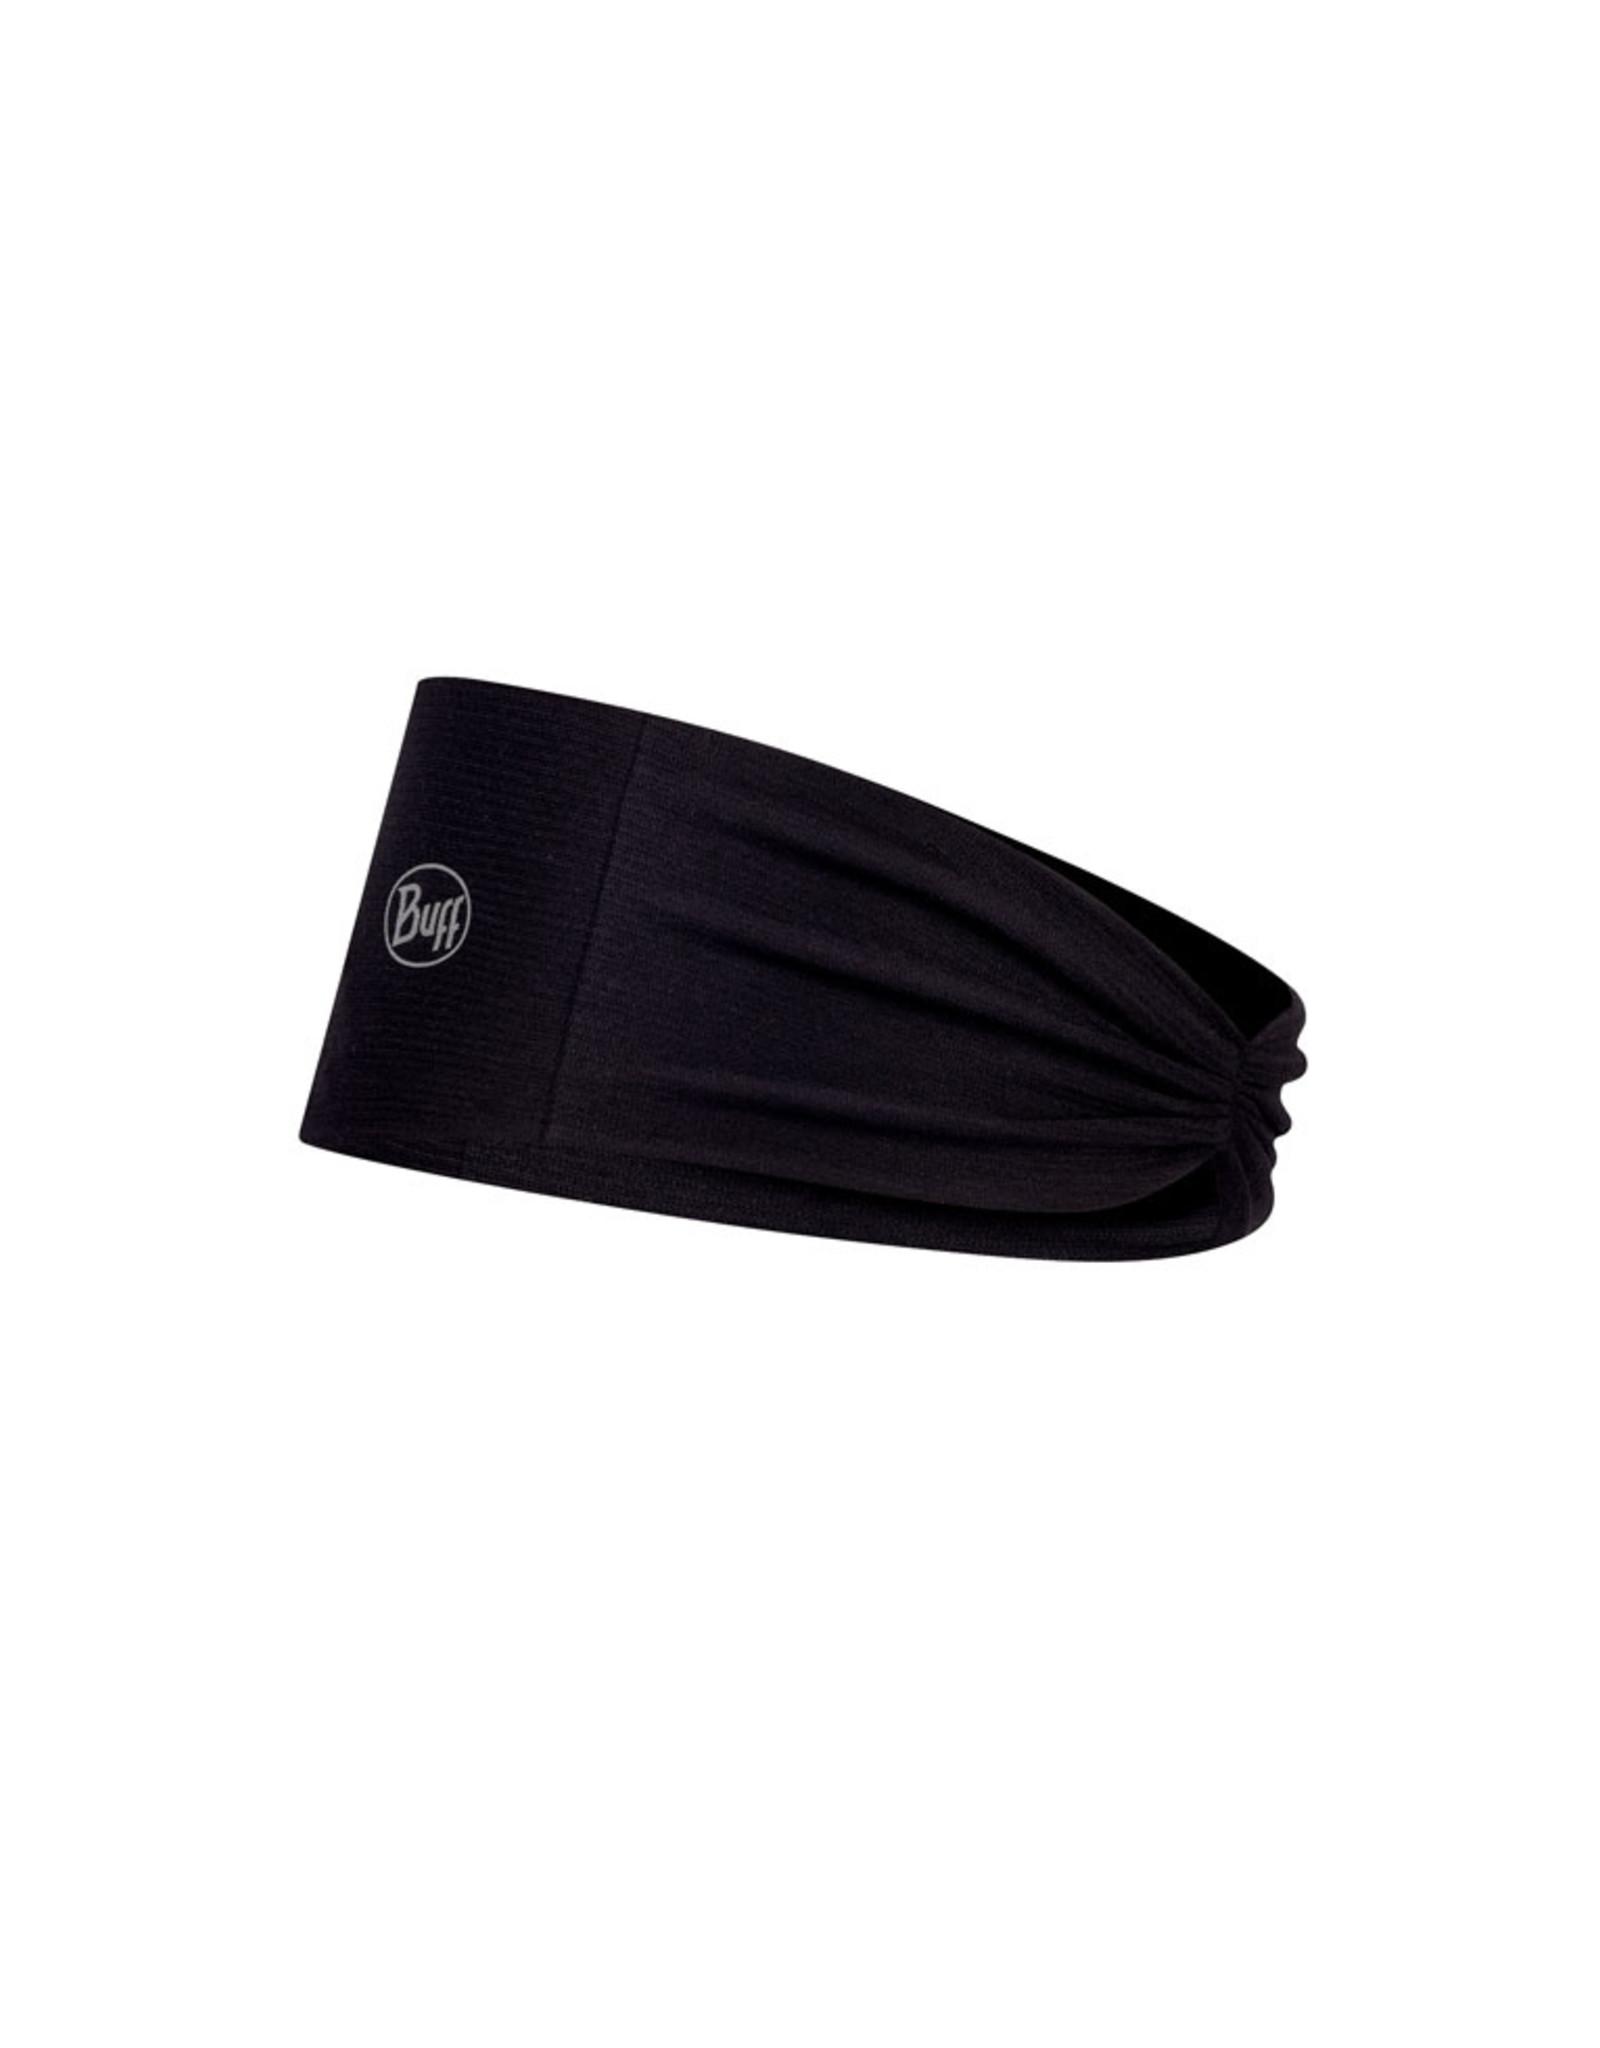 Buff CoolNet UV + Tapered Headband